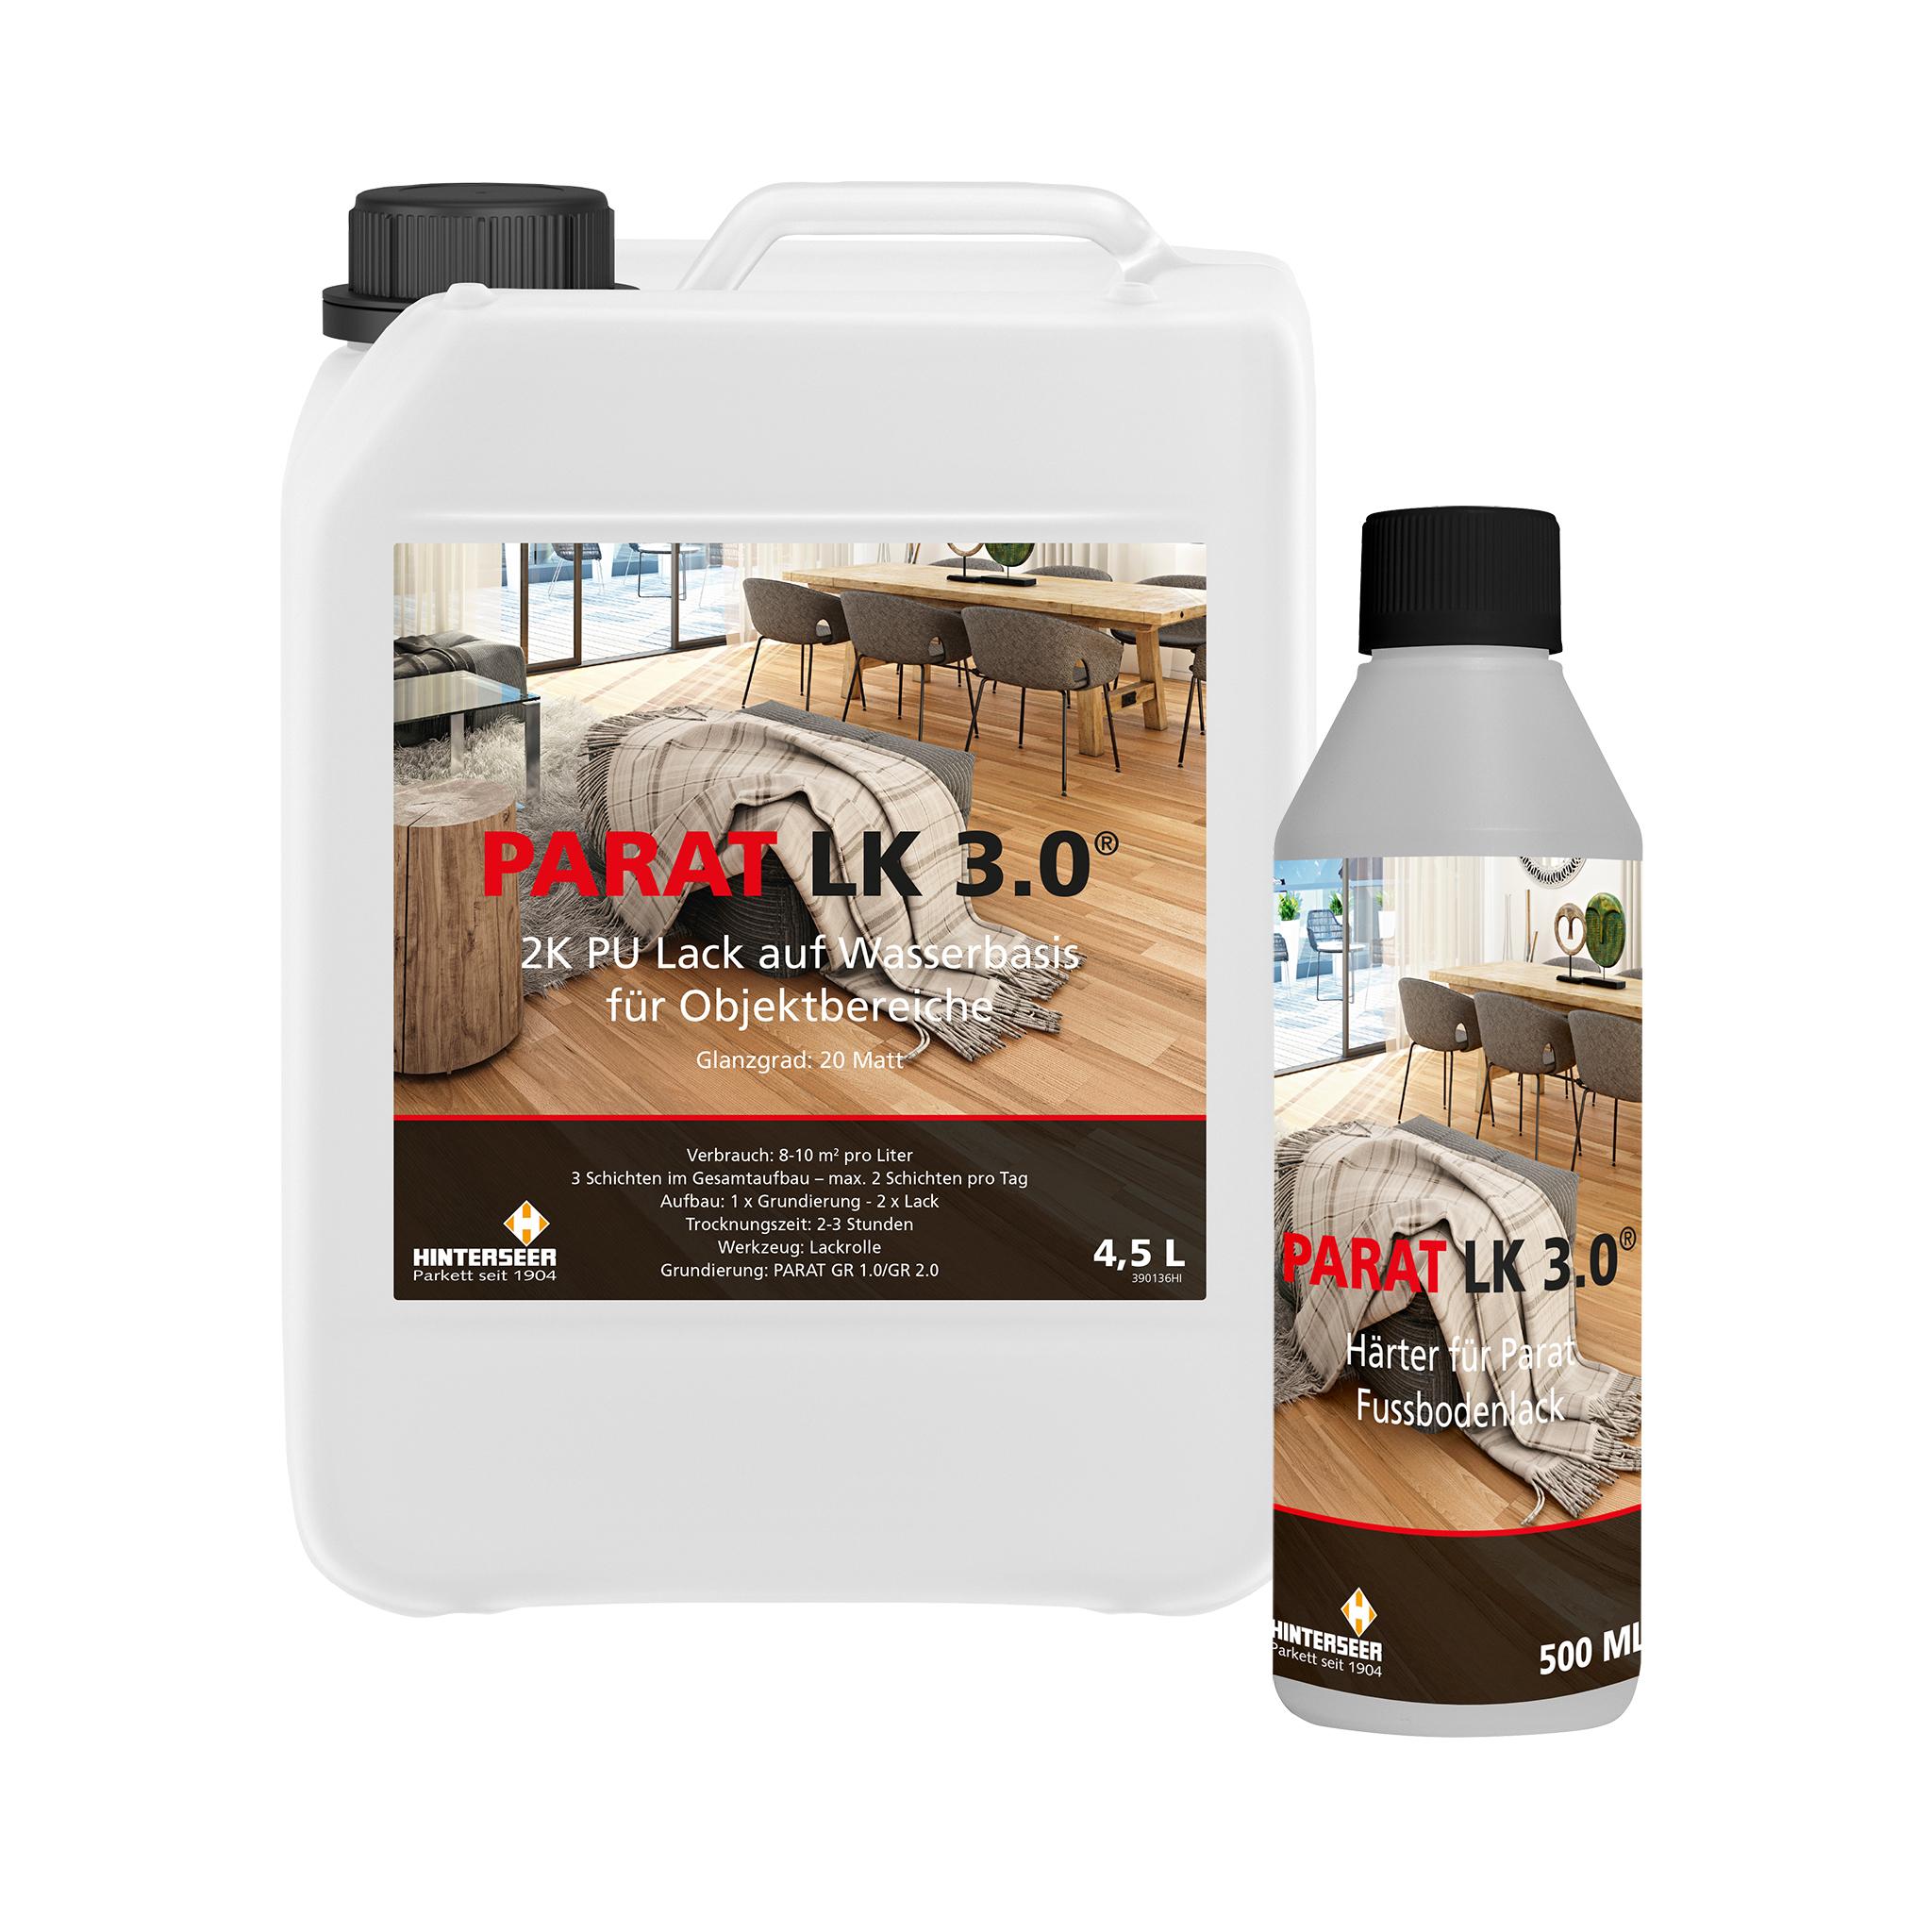 PARAT LK 3.0 parquet lacquer matt 5 Ltr.